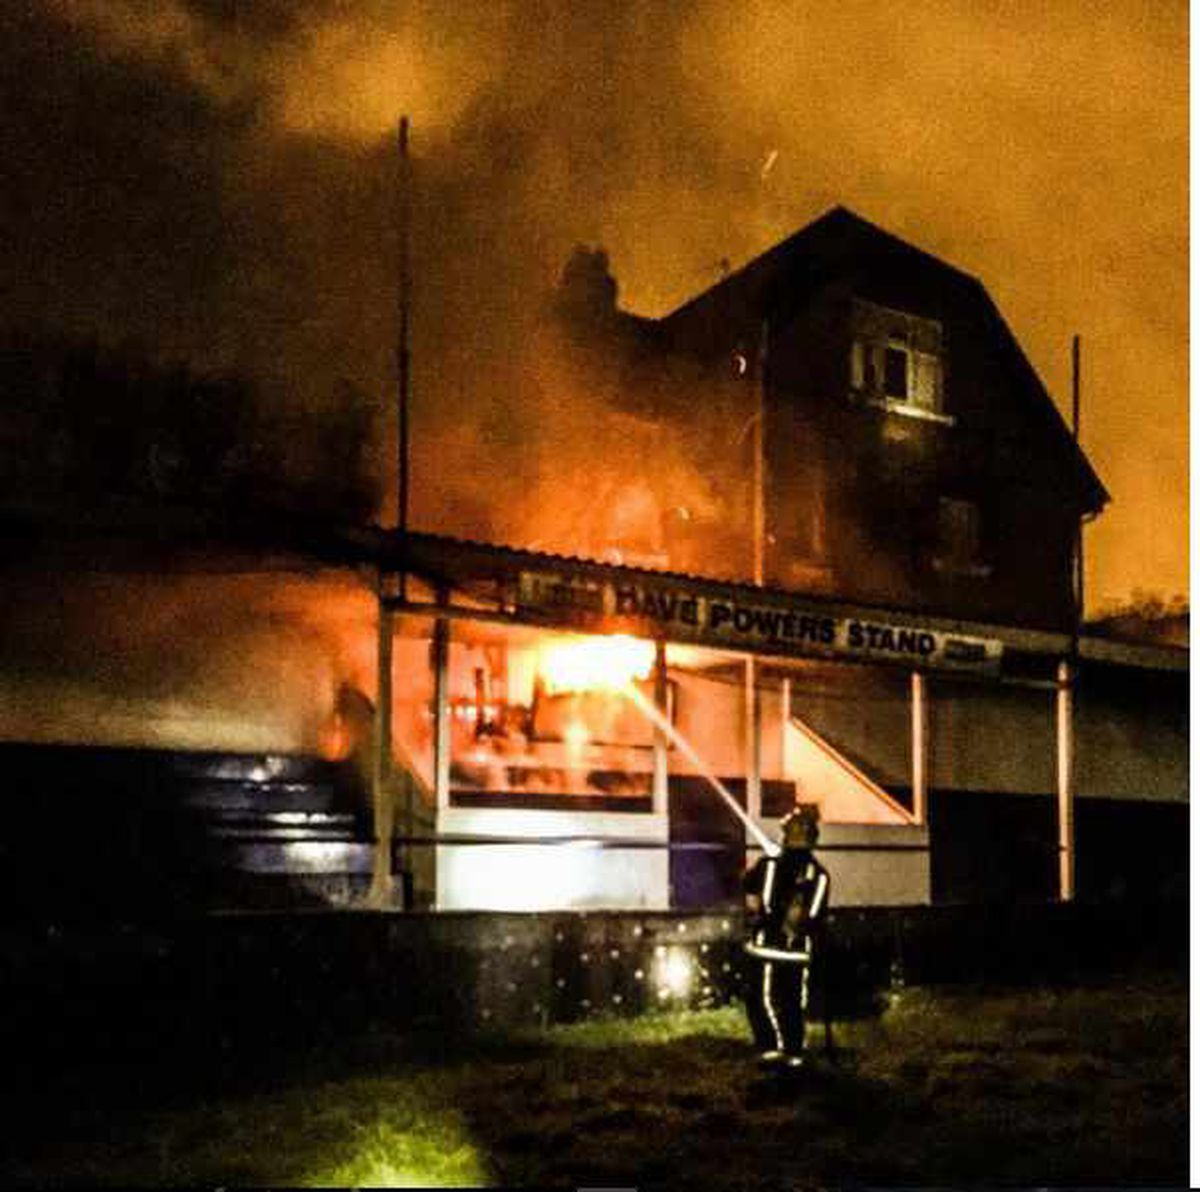 The recent blaze Photo: @wayne_official.uk via Instagram